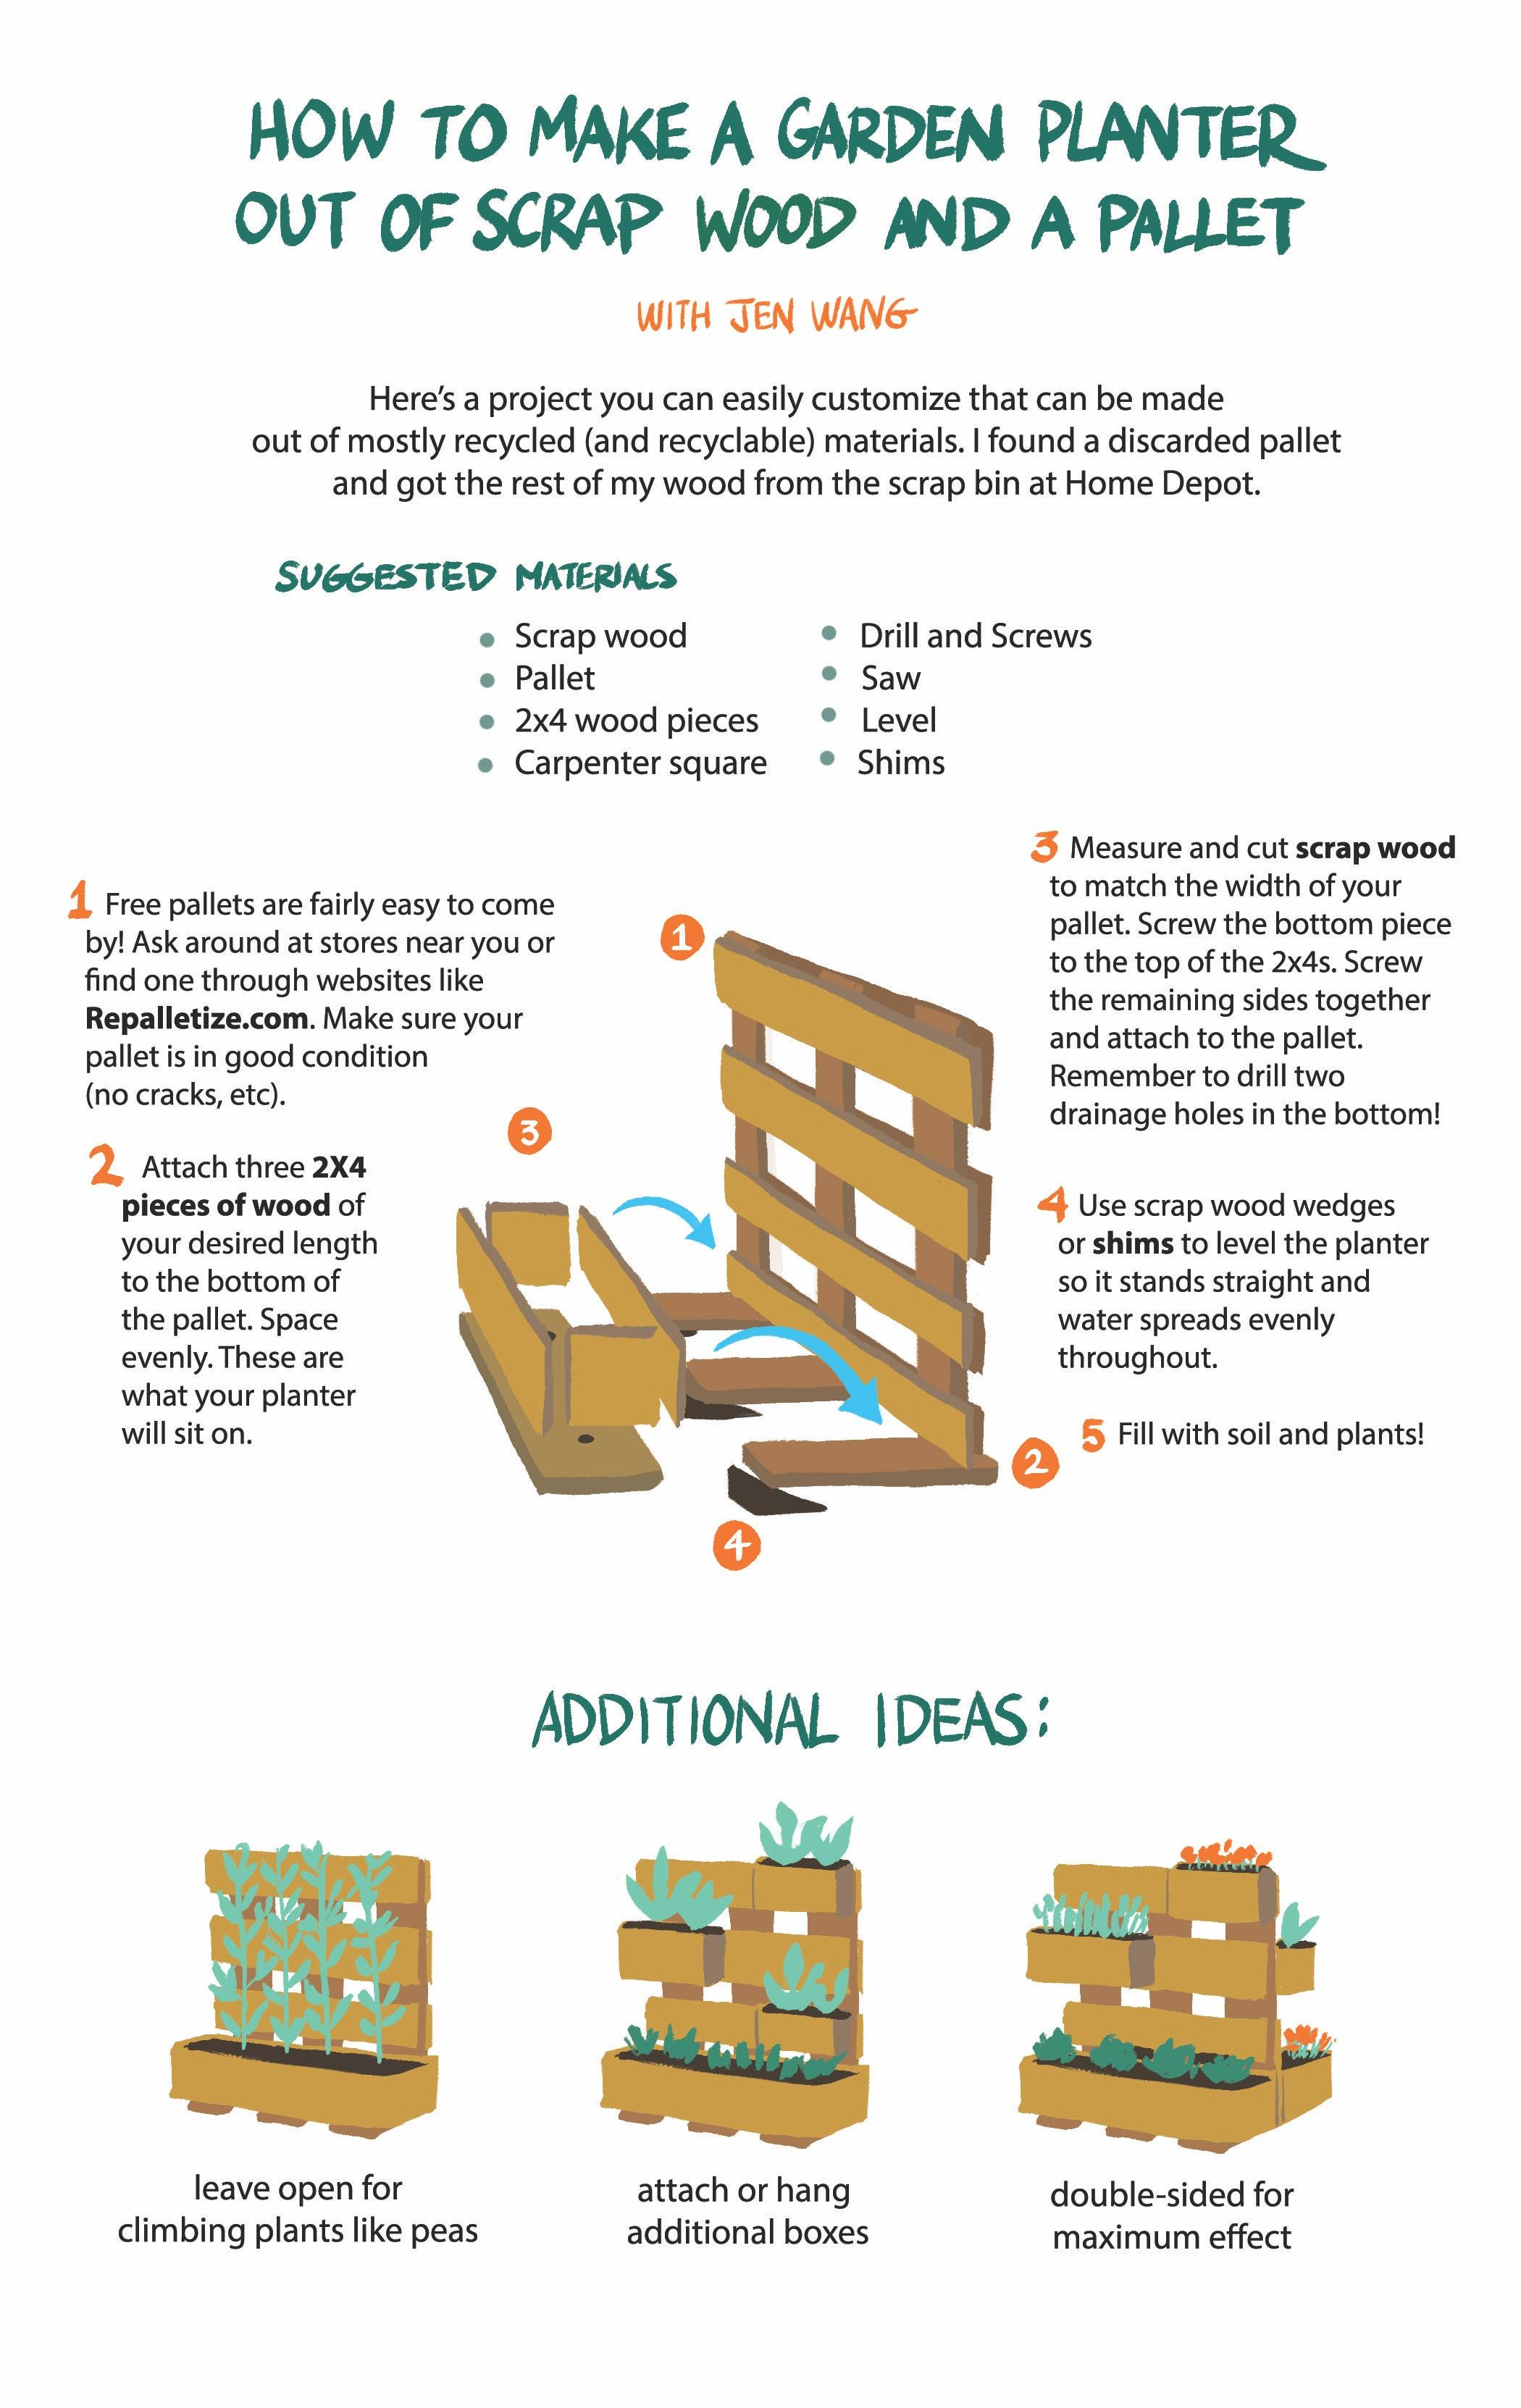 vertical garden diy ideas using a wooden pallet tutorial - Garden Ideas Using Wooden Pallets